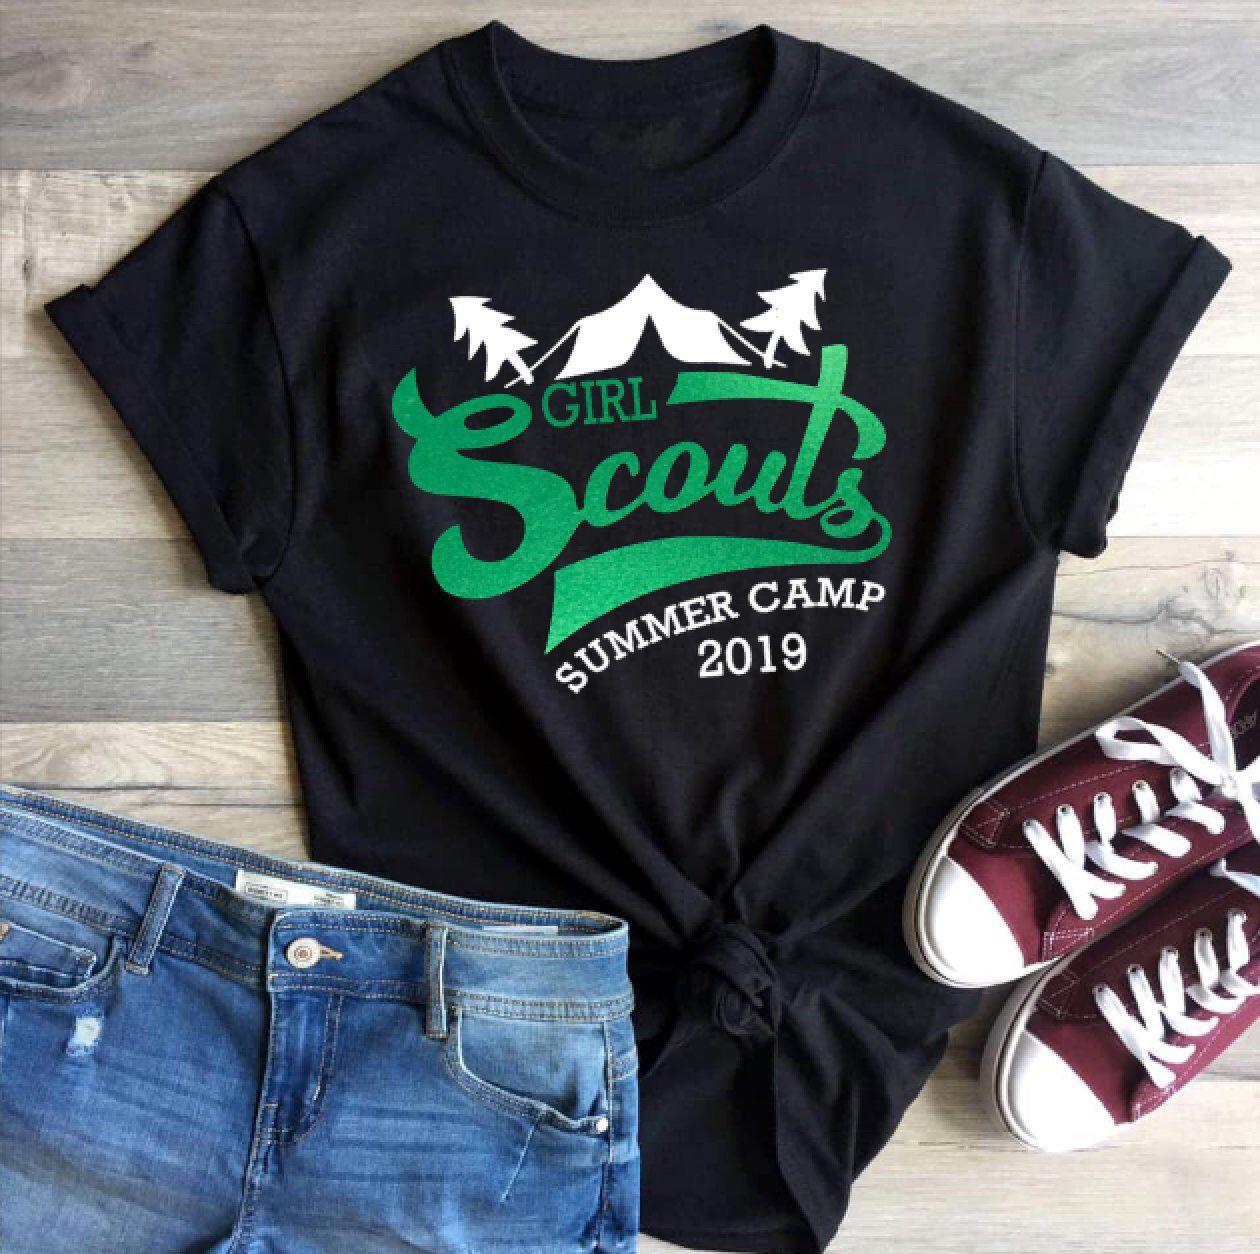 Girl Scout Summer Camp 2019 Shirt | Girl Scout / Boy Scout